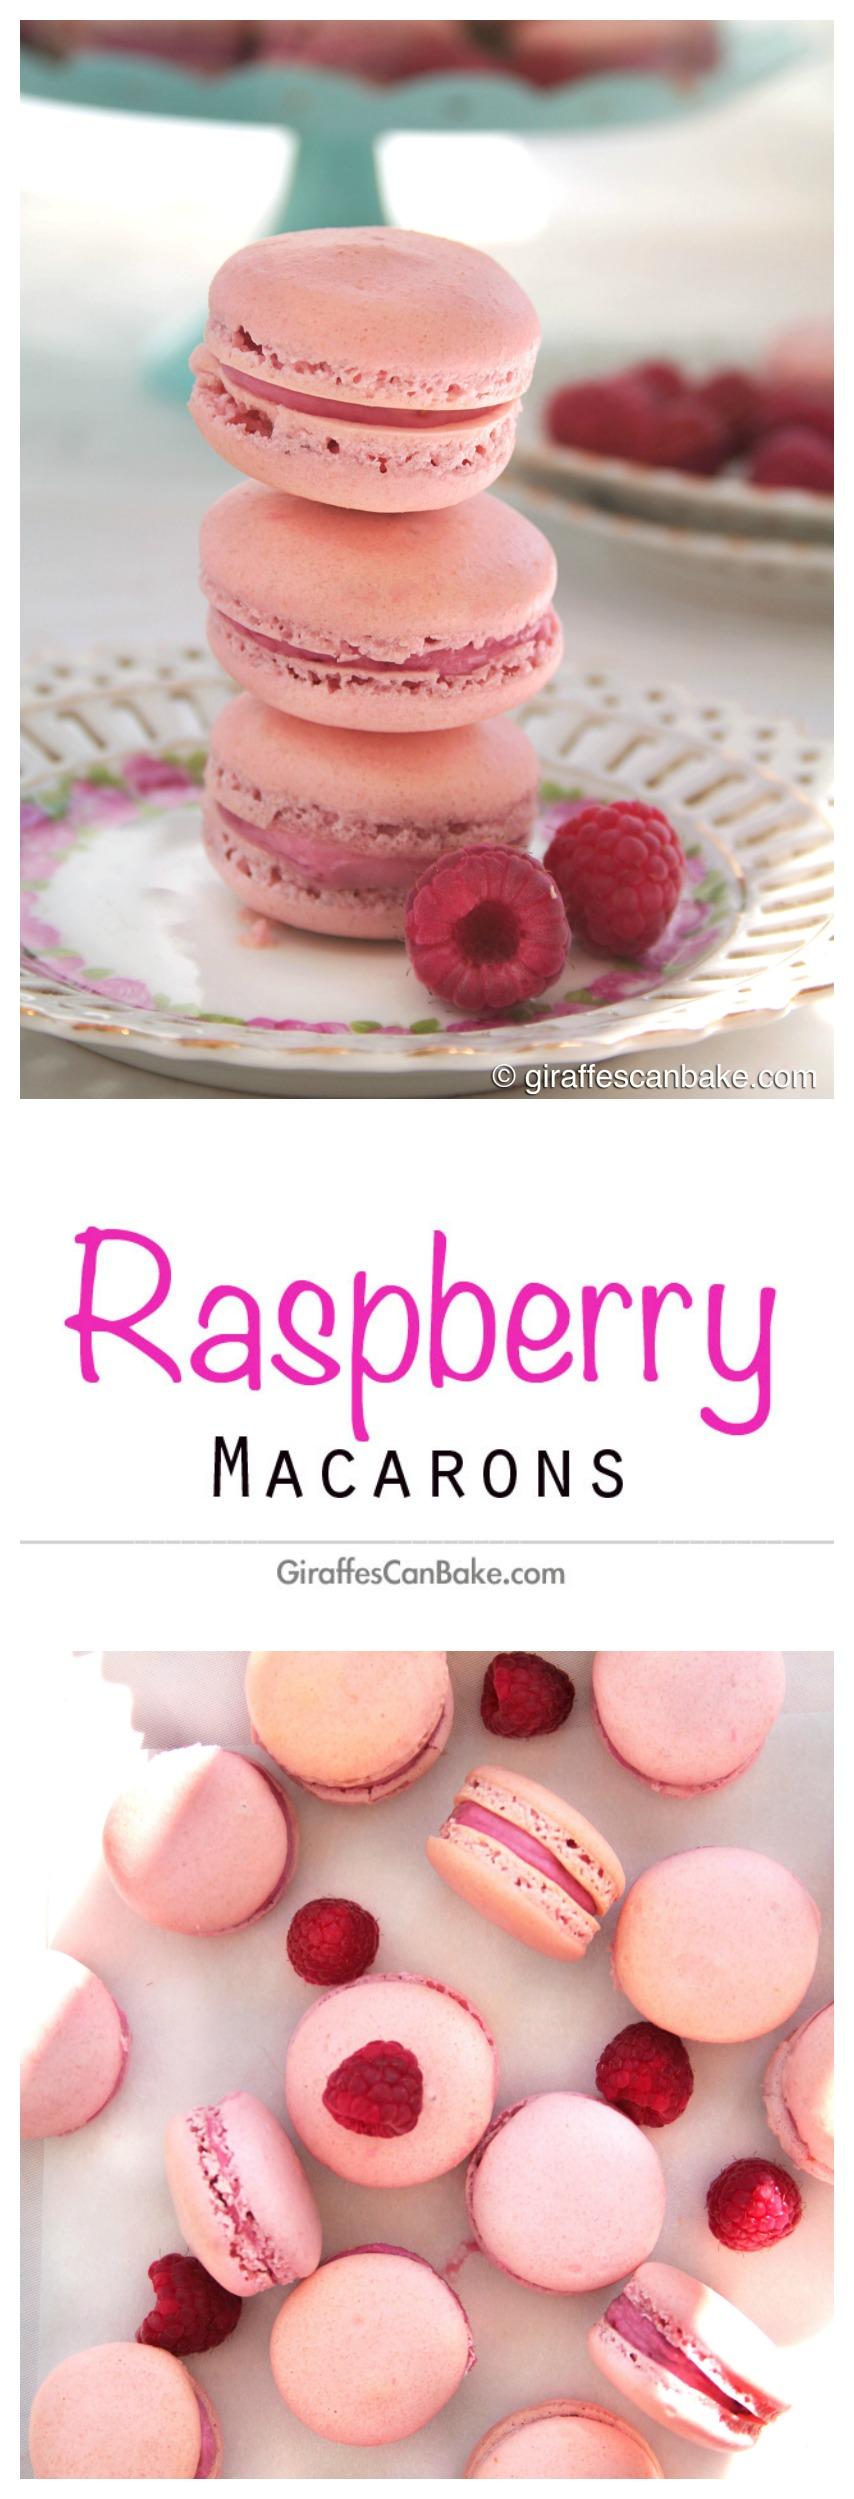 Raspberry Macarons by Giraffes Can Bake